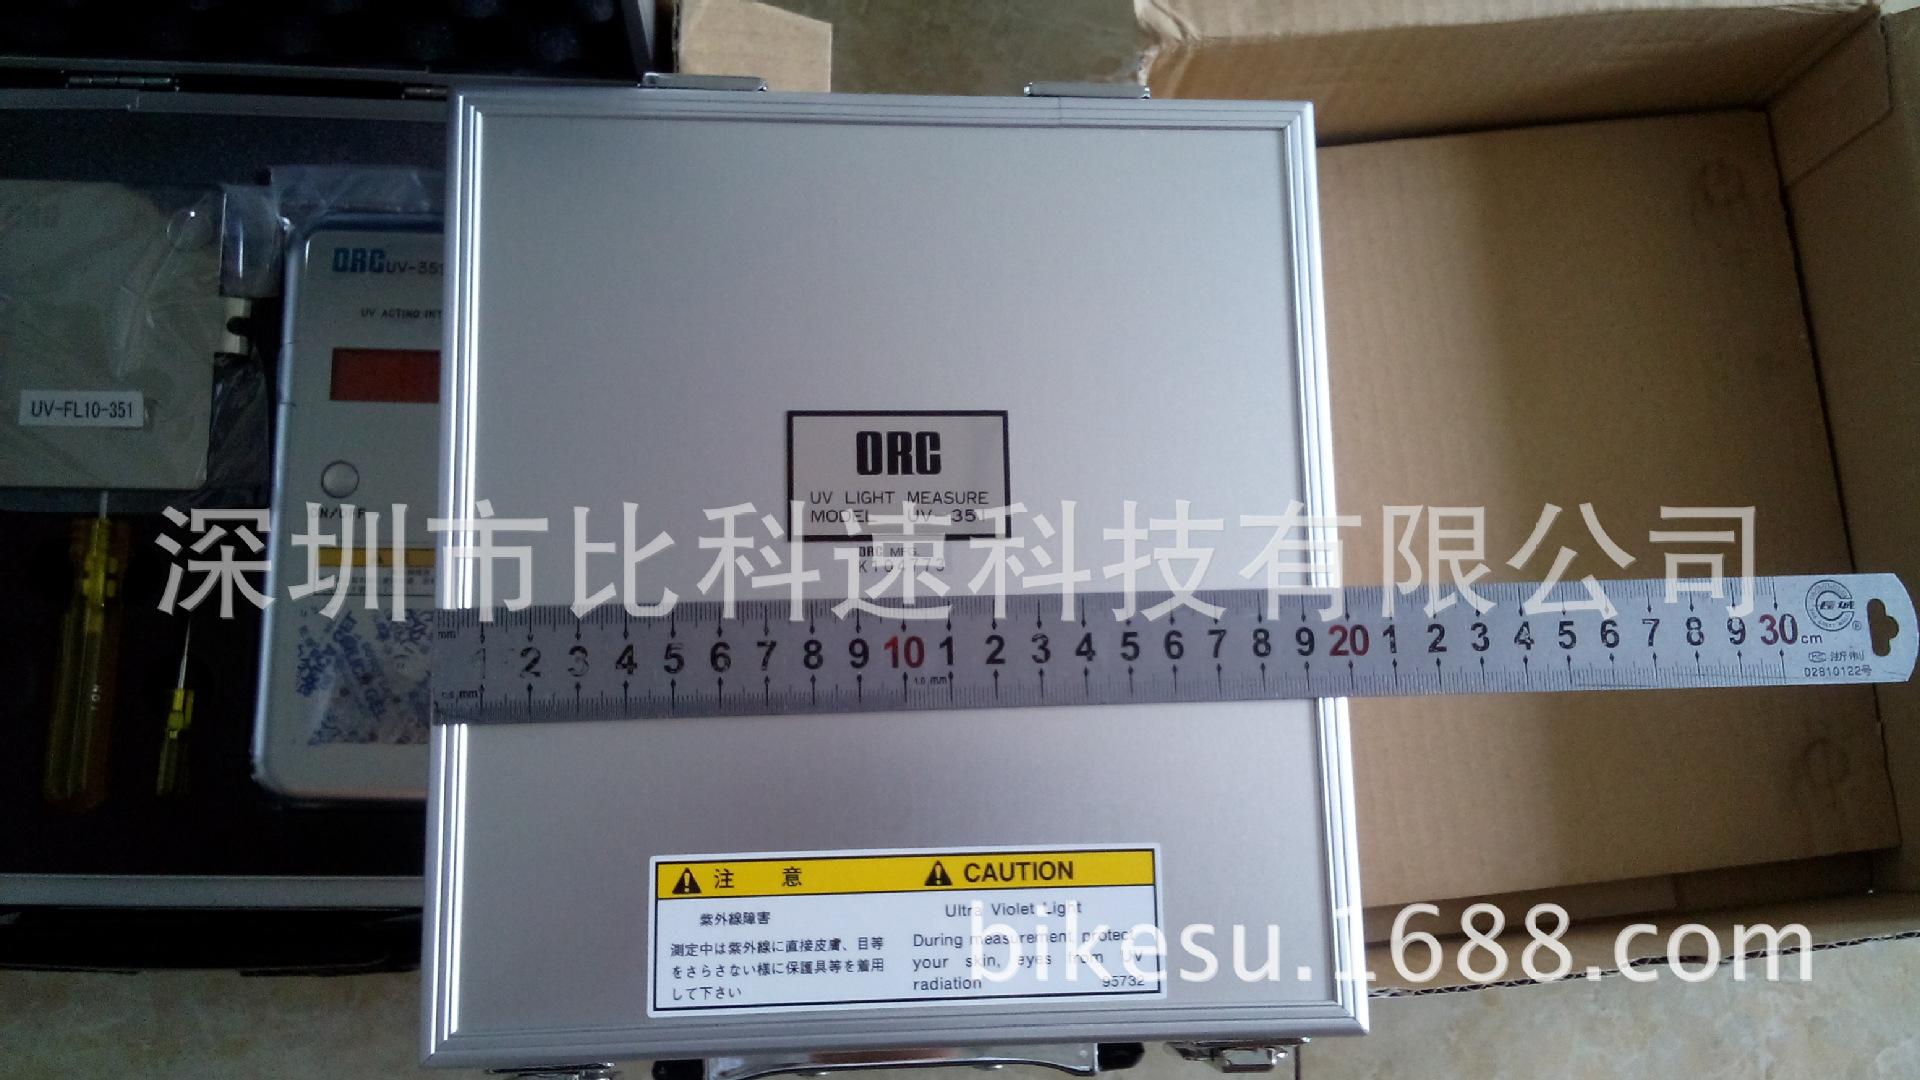 日本uv能量计_供应日本ORCUV-351能量计日本UVAORC351UV能量计